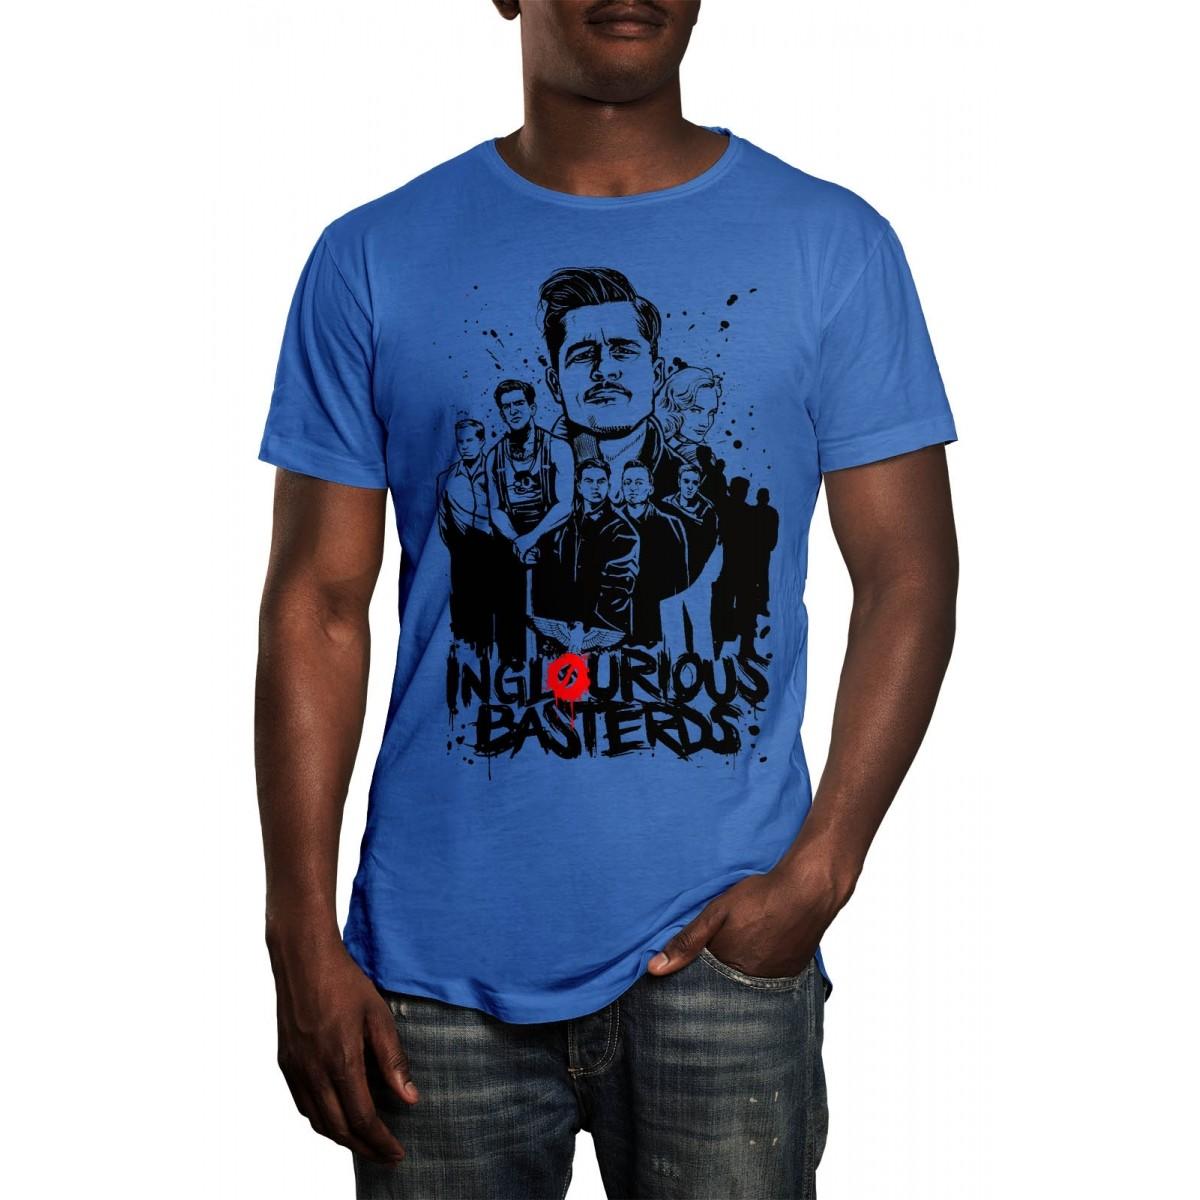 Camiseta HShop Bastardos Inglórios Azul  - HShop